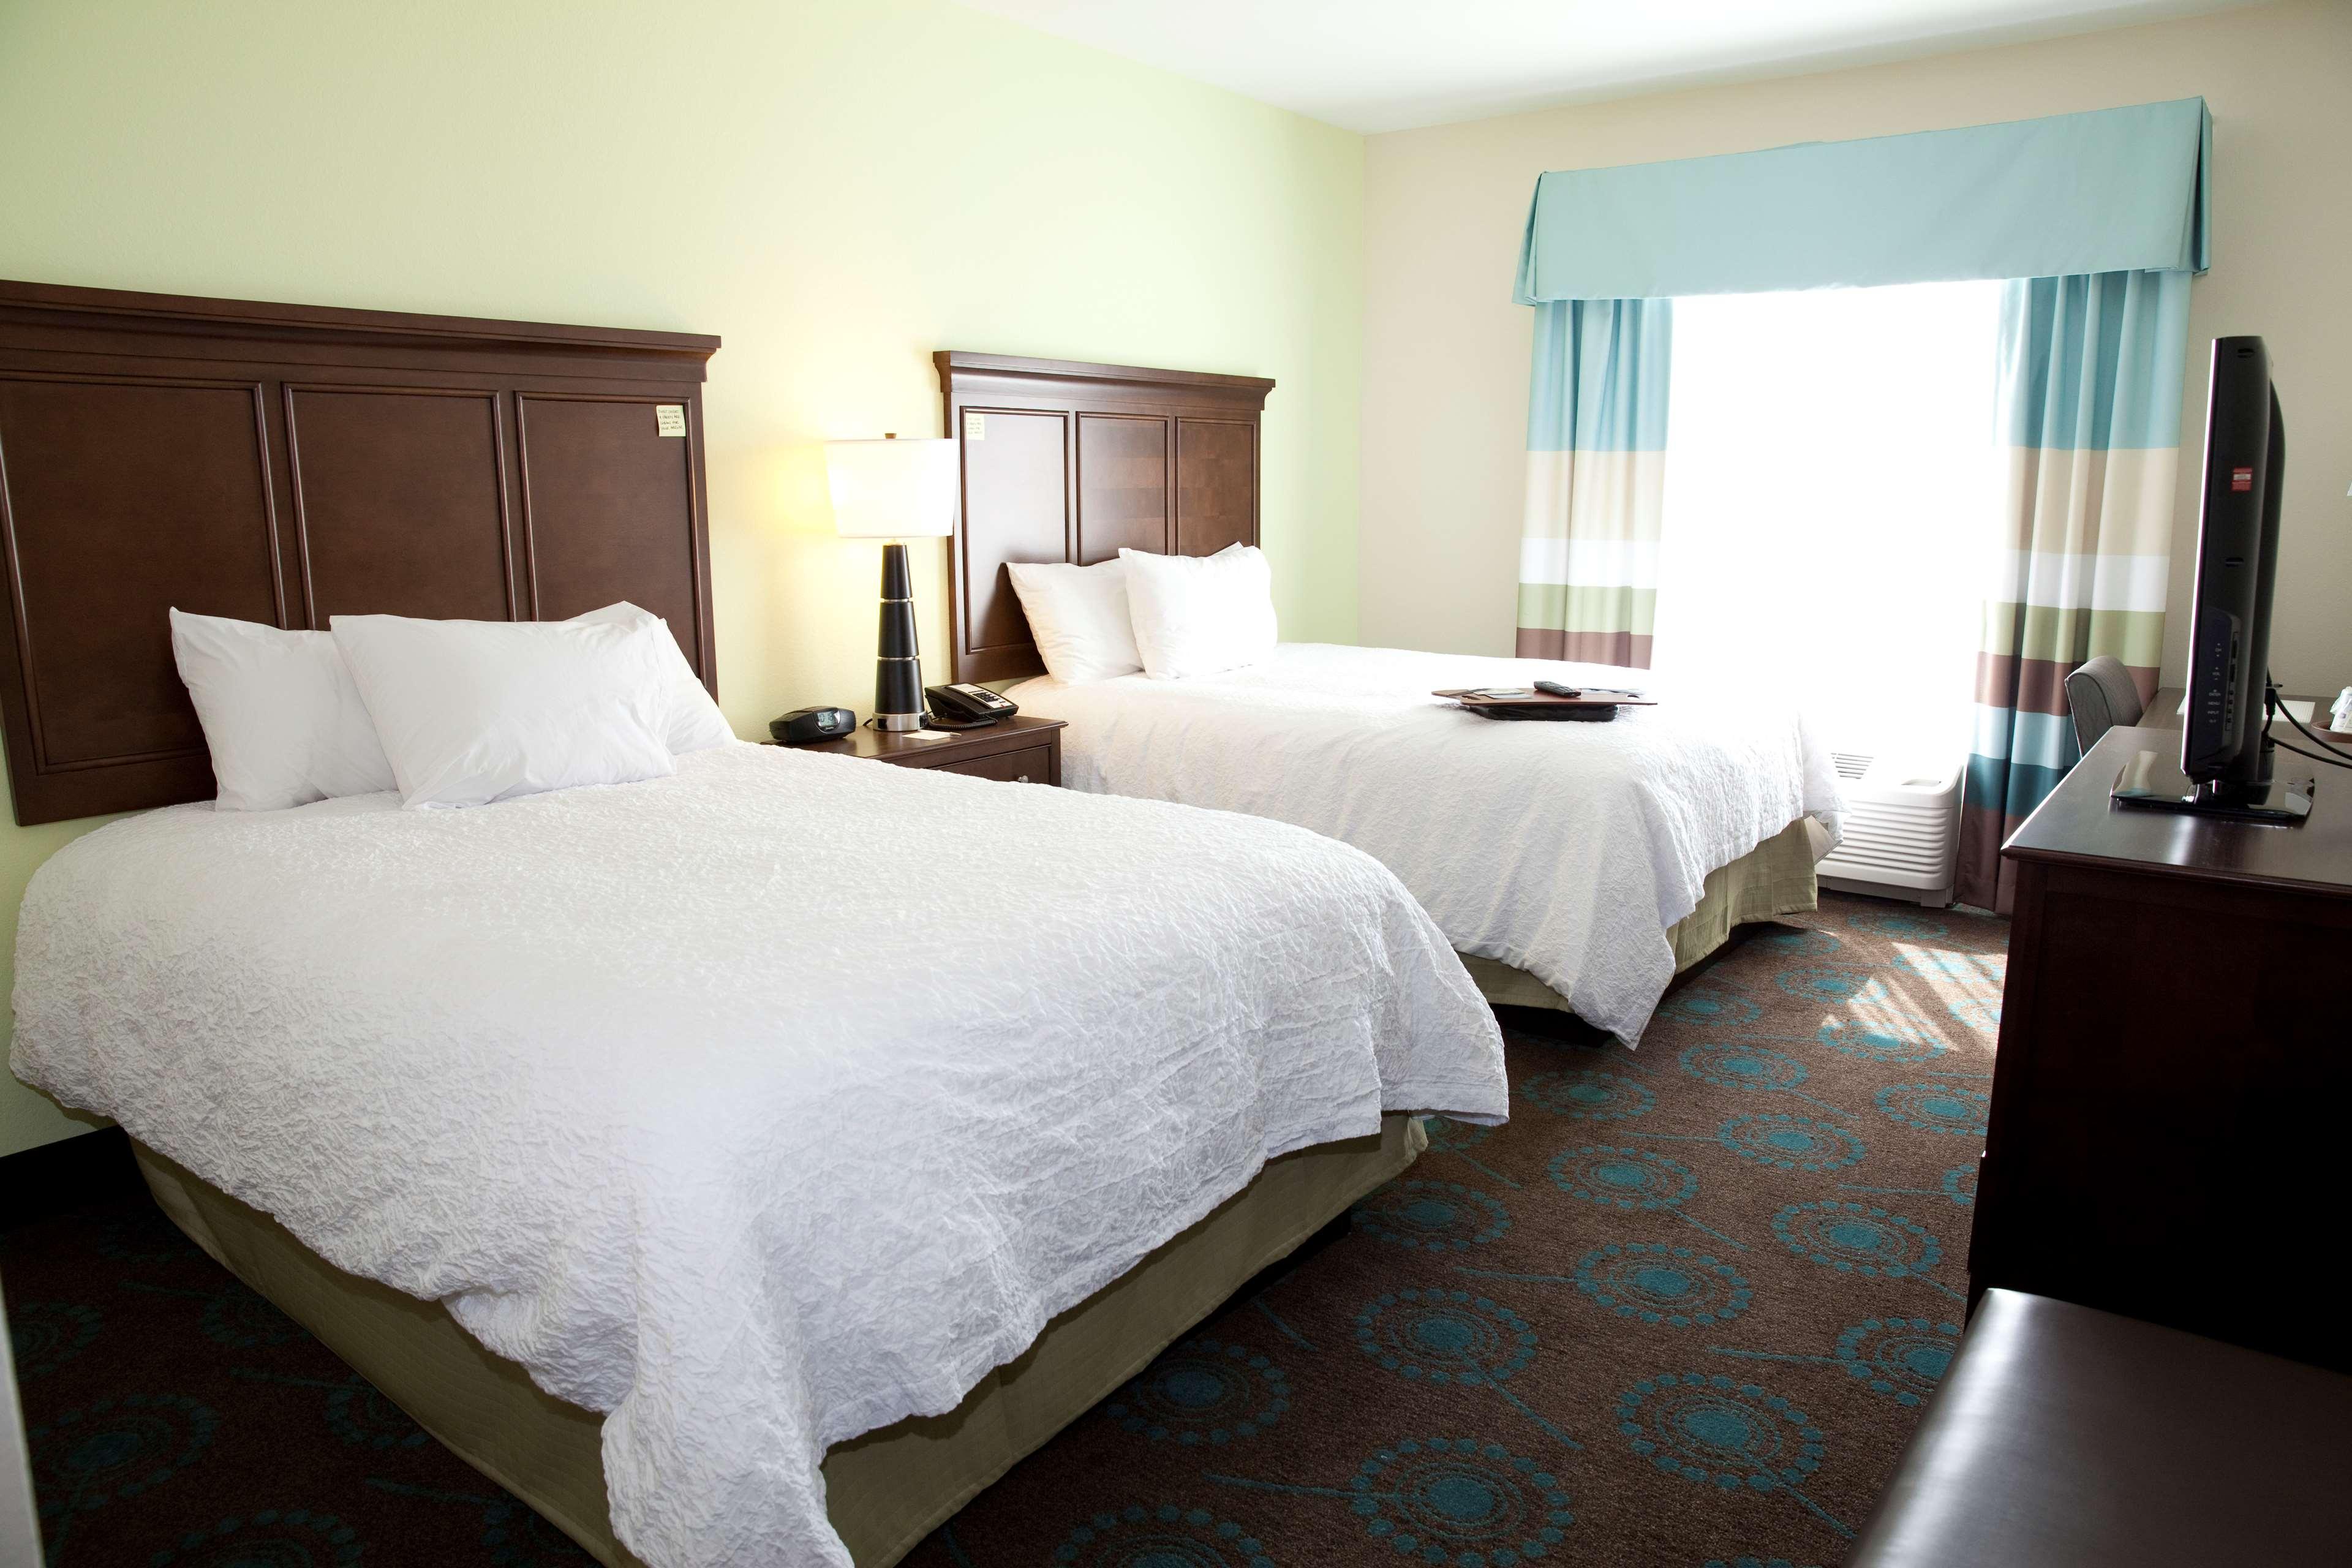 Hampton Inn & Suites Wheeling-The Highlands image 12